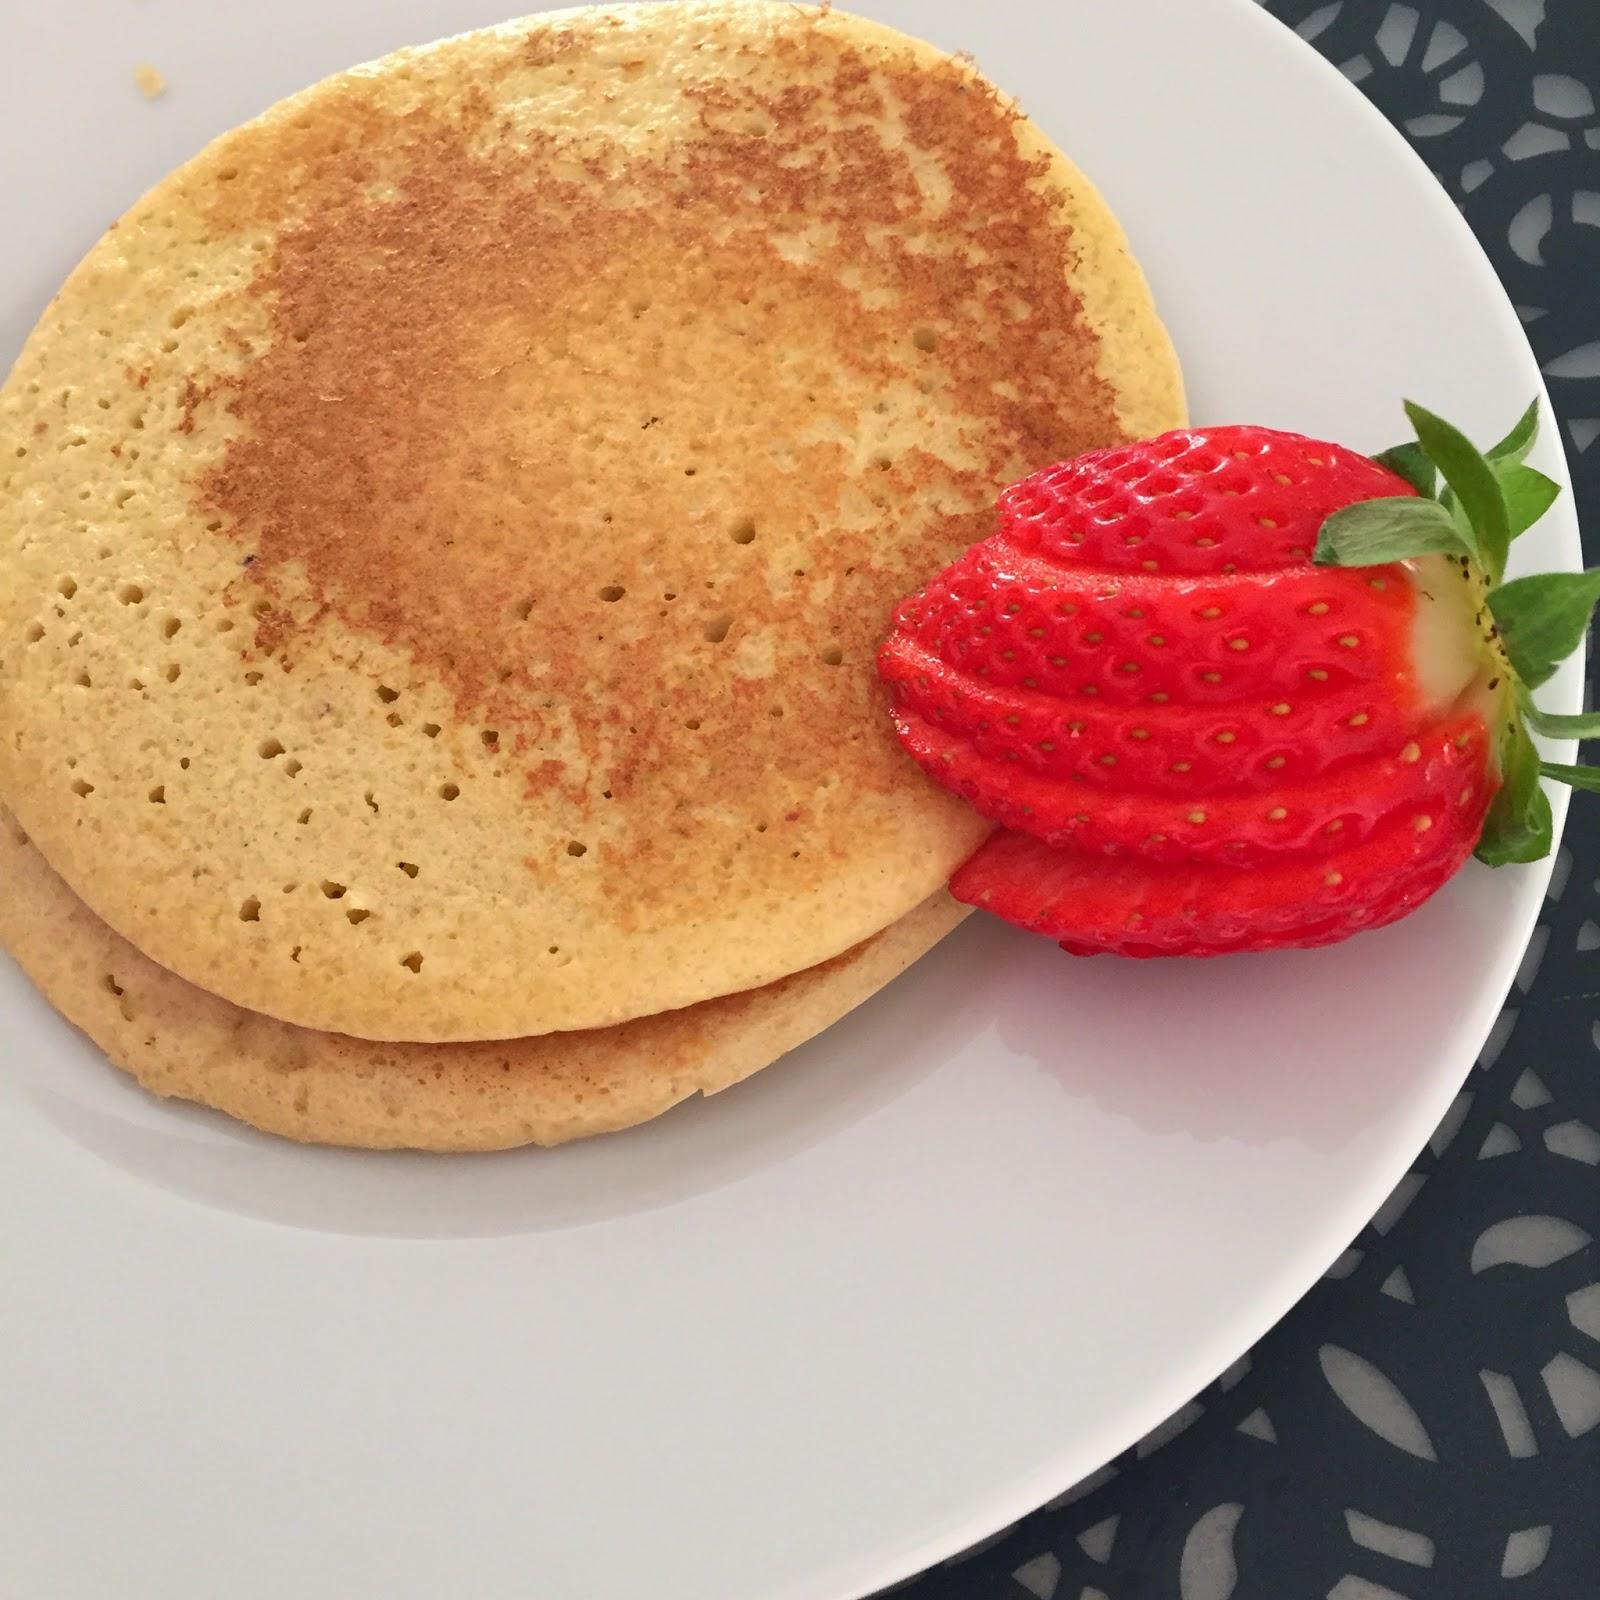 panquecas almendra, tortitas almendra, almond pancakes